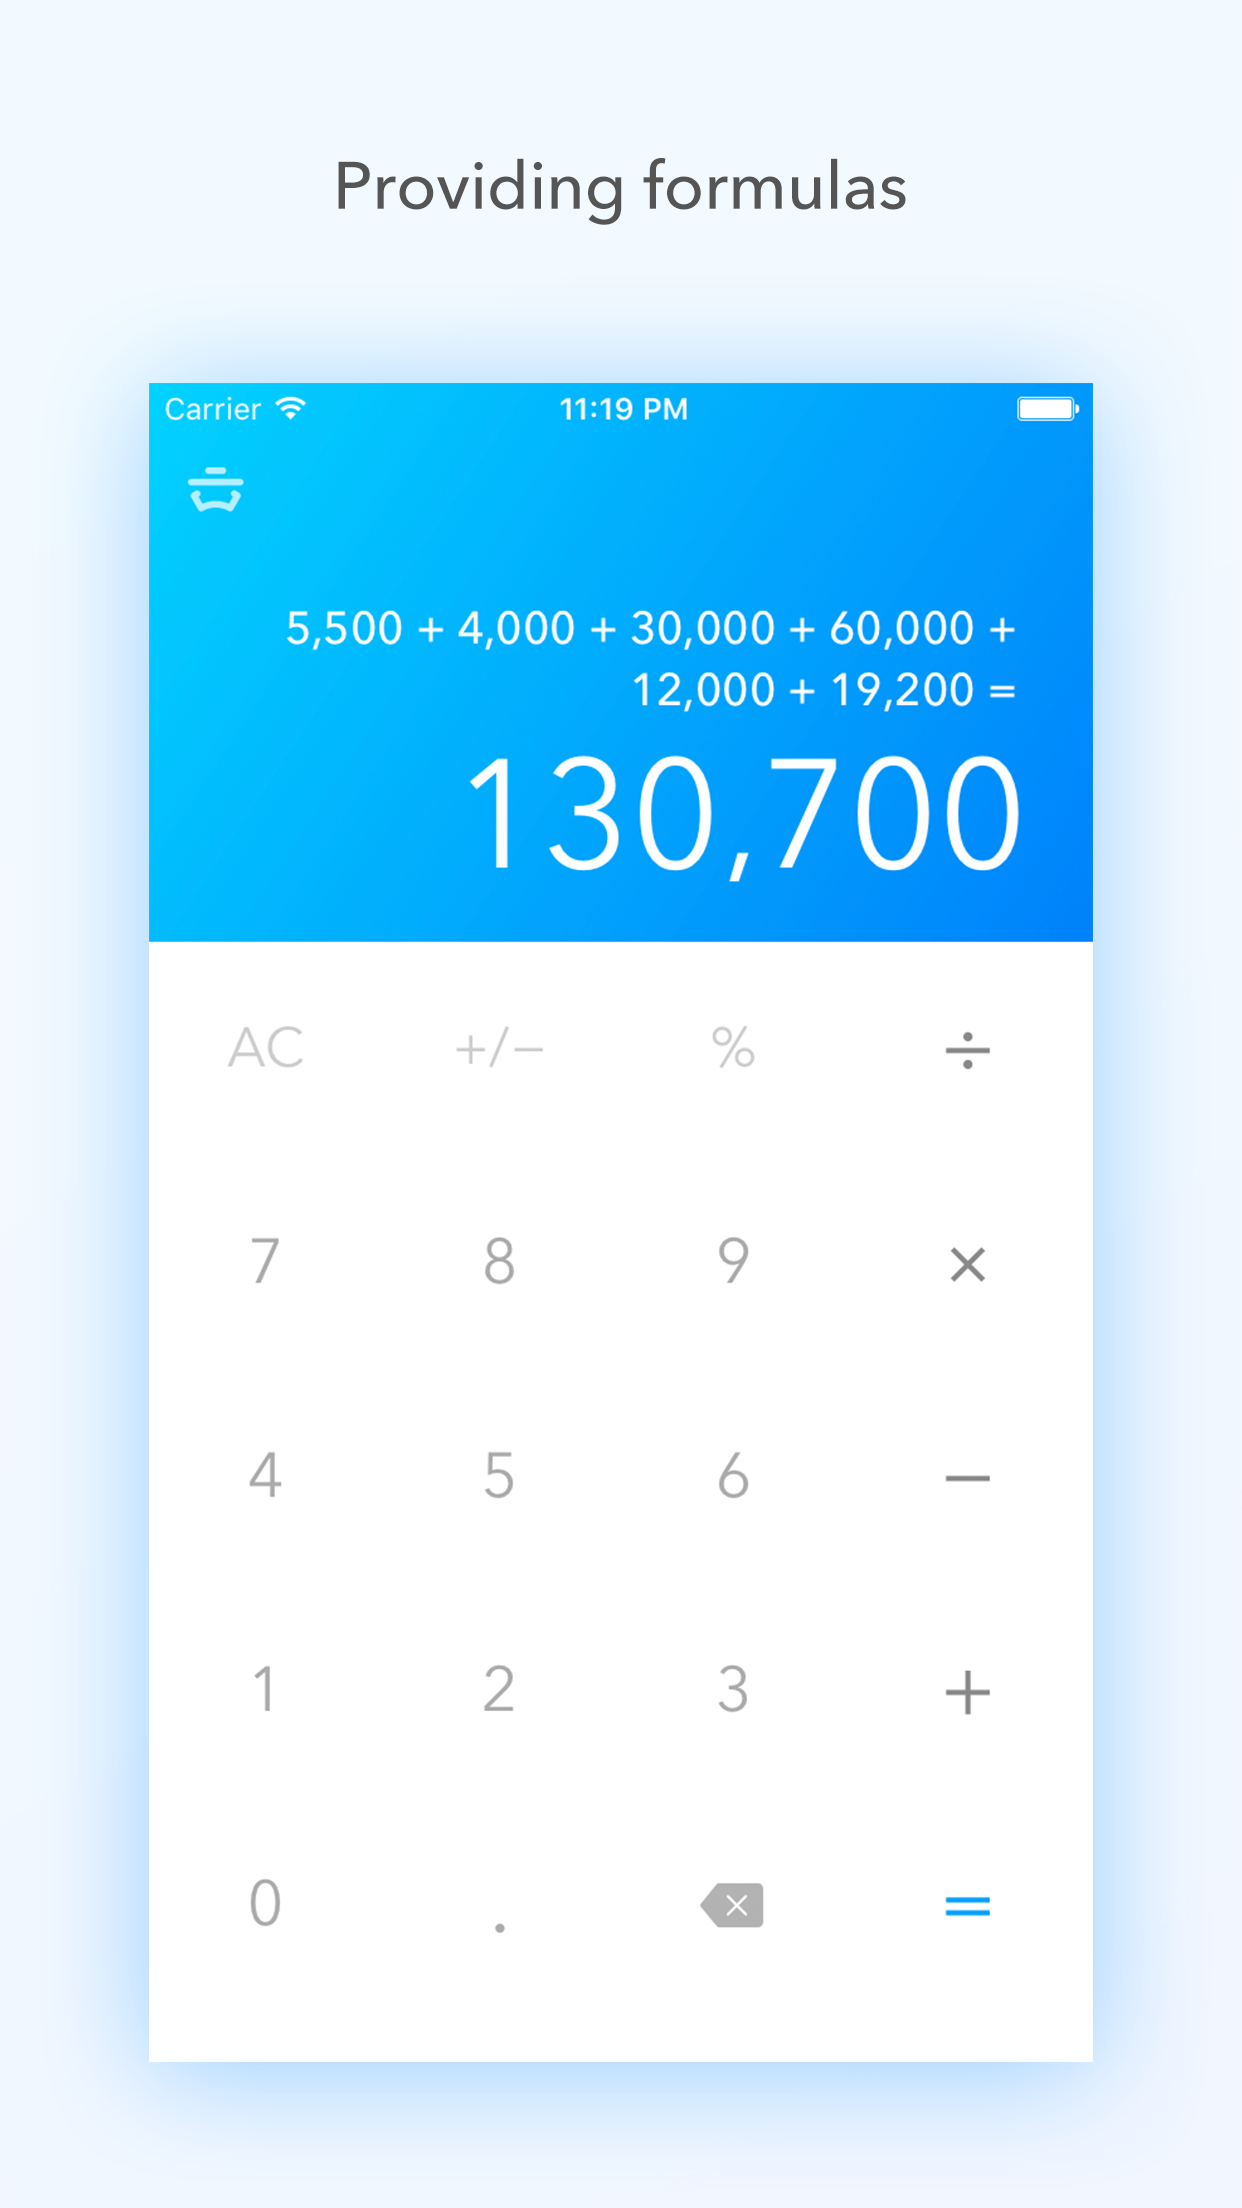 Providing Formulas Calculator History Calculation Pretty Easy Essential Percent Good Easy Household Best Ipad In 2020 Basic Calculators App Calculator App